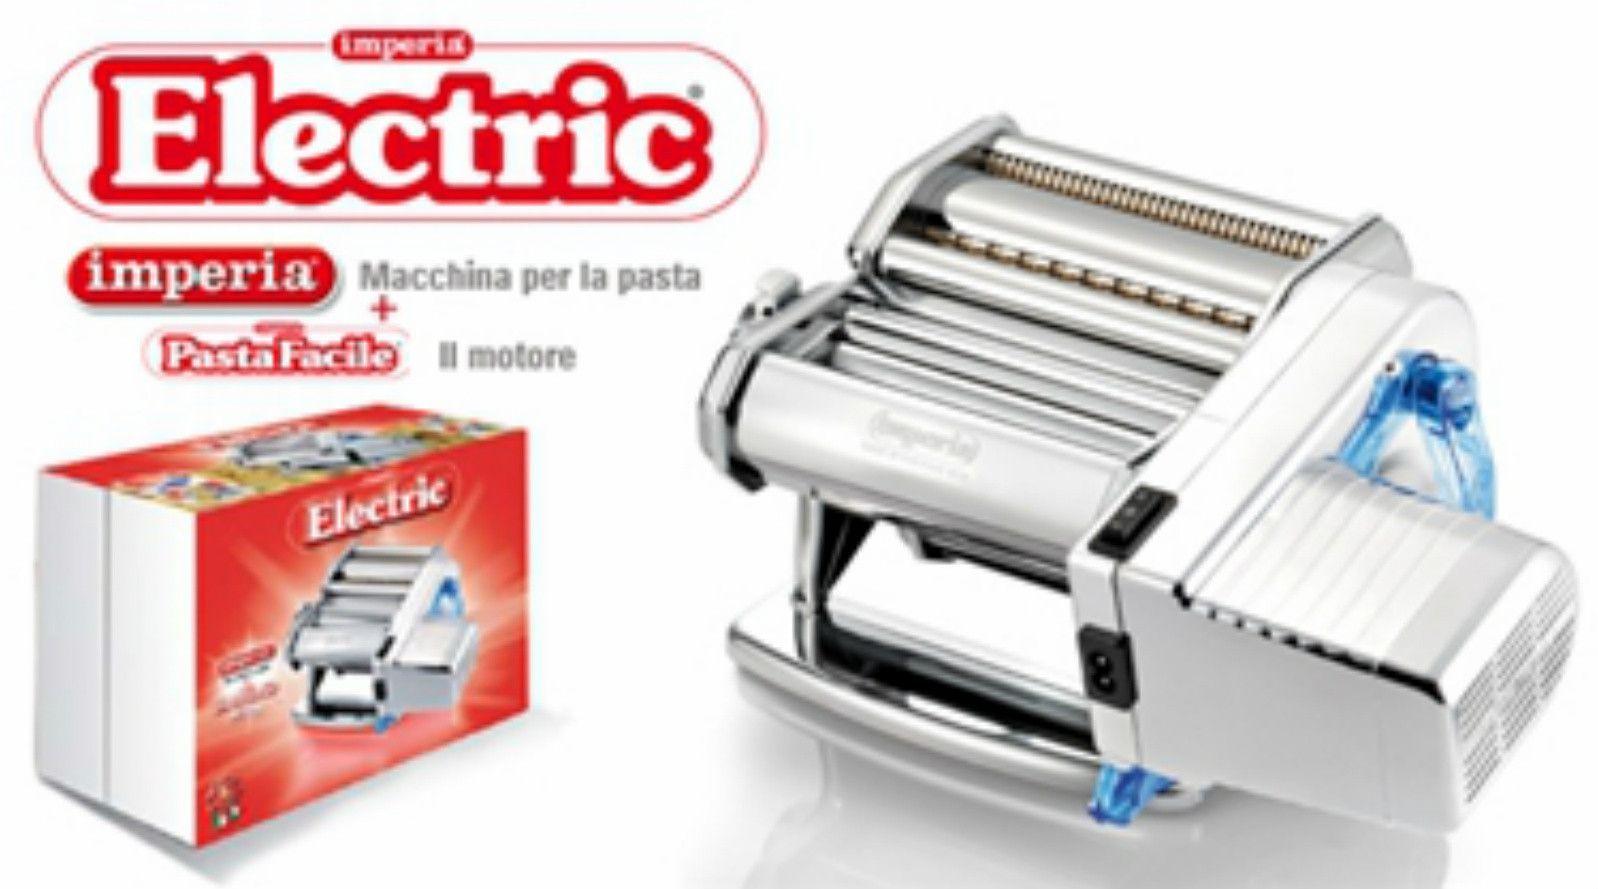 Imperia 150mm Electric Pasta Maker